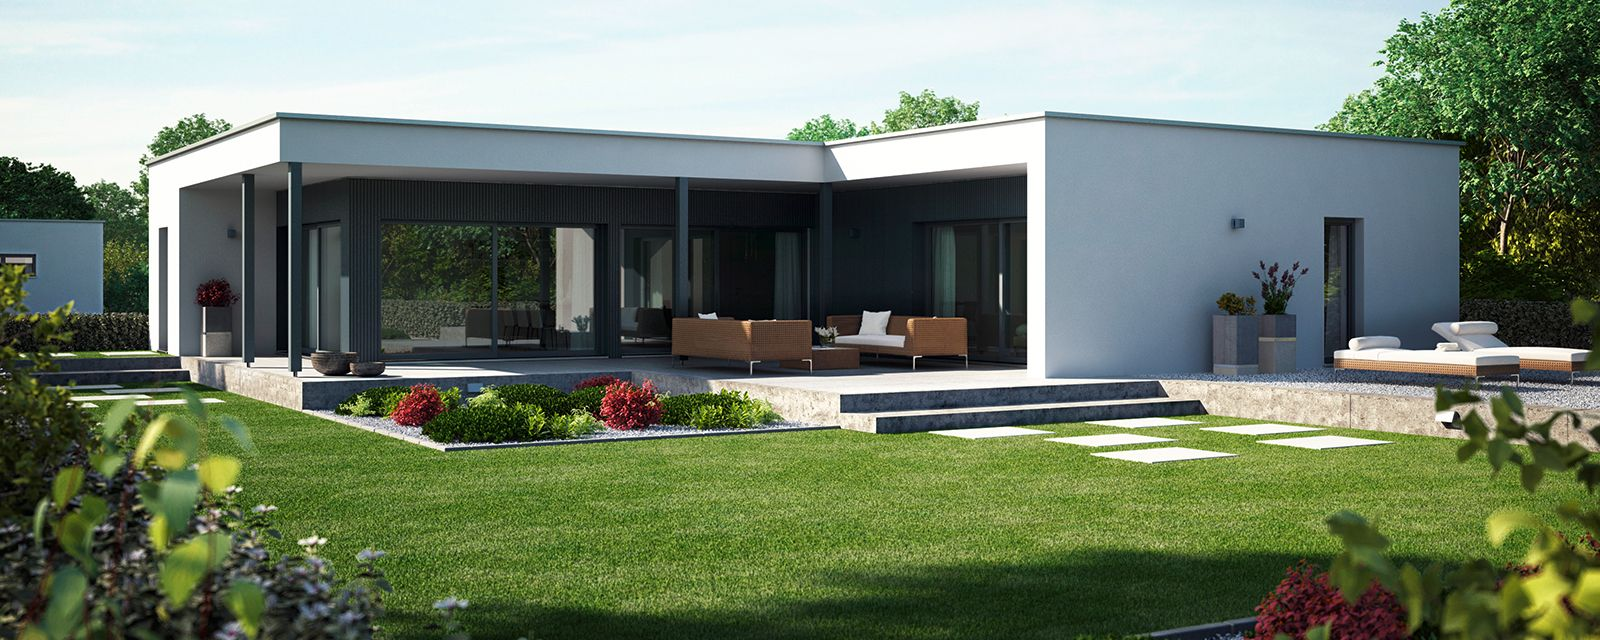 Flachdachbungalow Modern bungalow verbouwen interieur zoeken modern bungalow